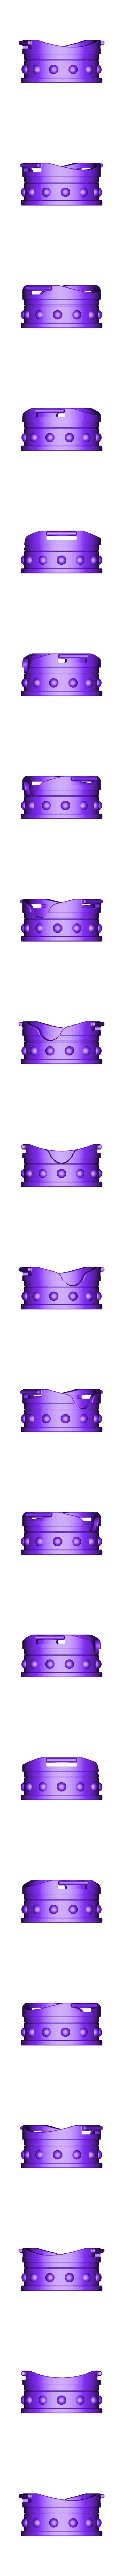 Goggle_Minions_1_eye.stl Download free STL file Minions Goggle Monoeye • 3D printer design, MVSValero